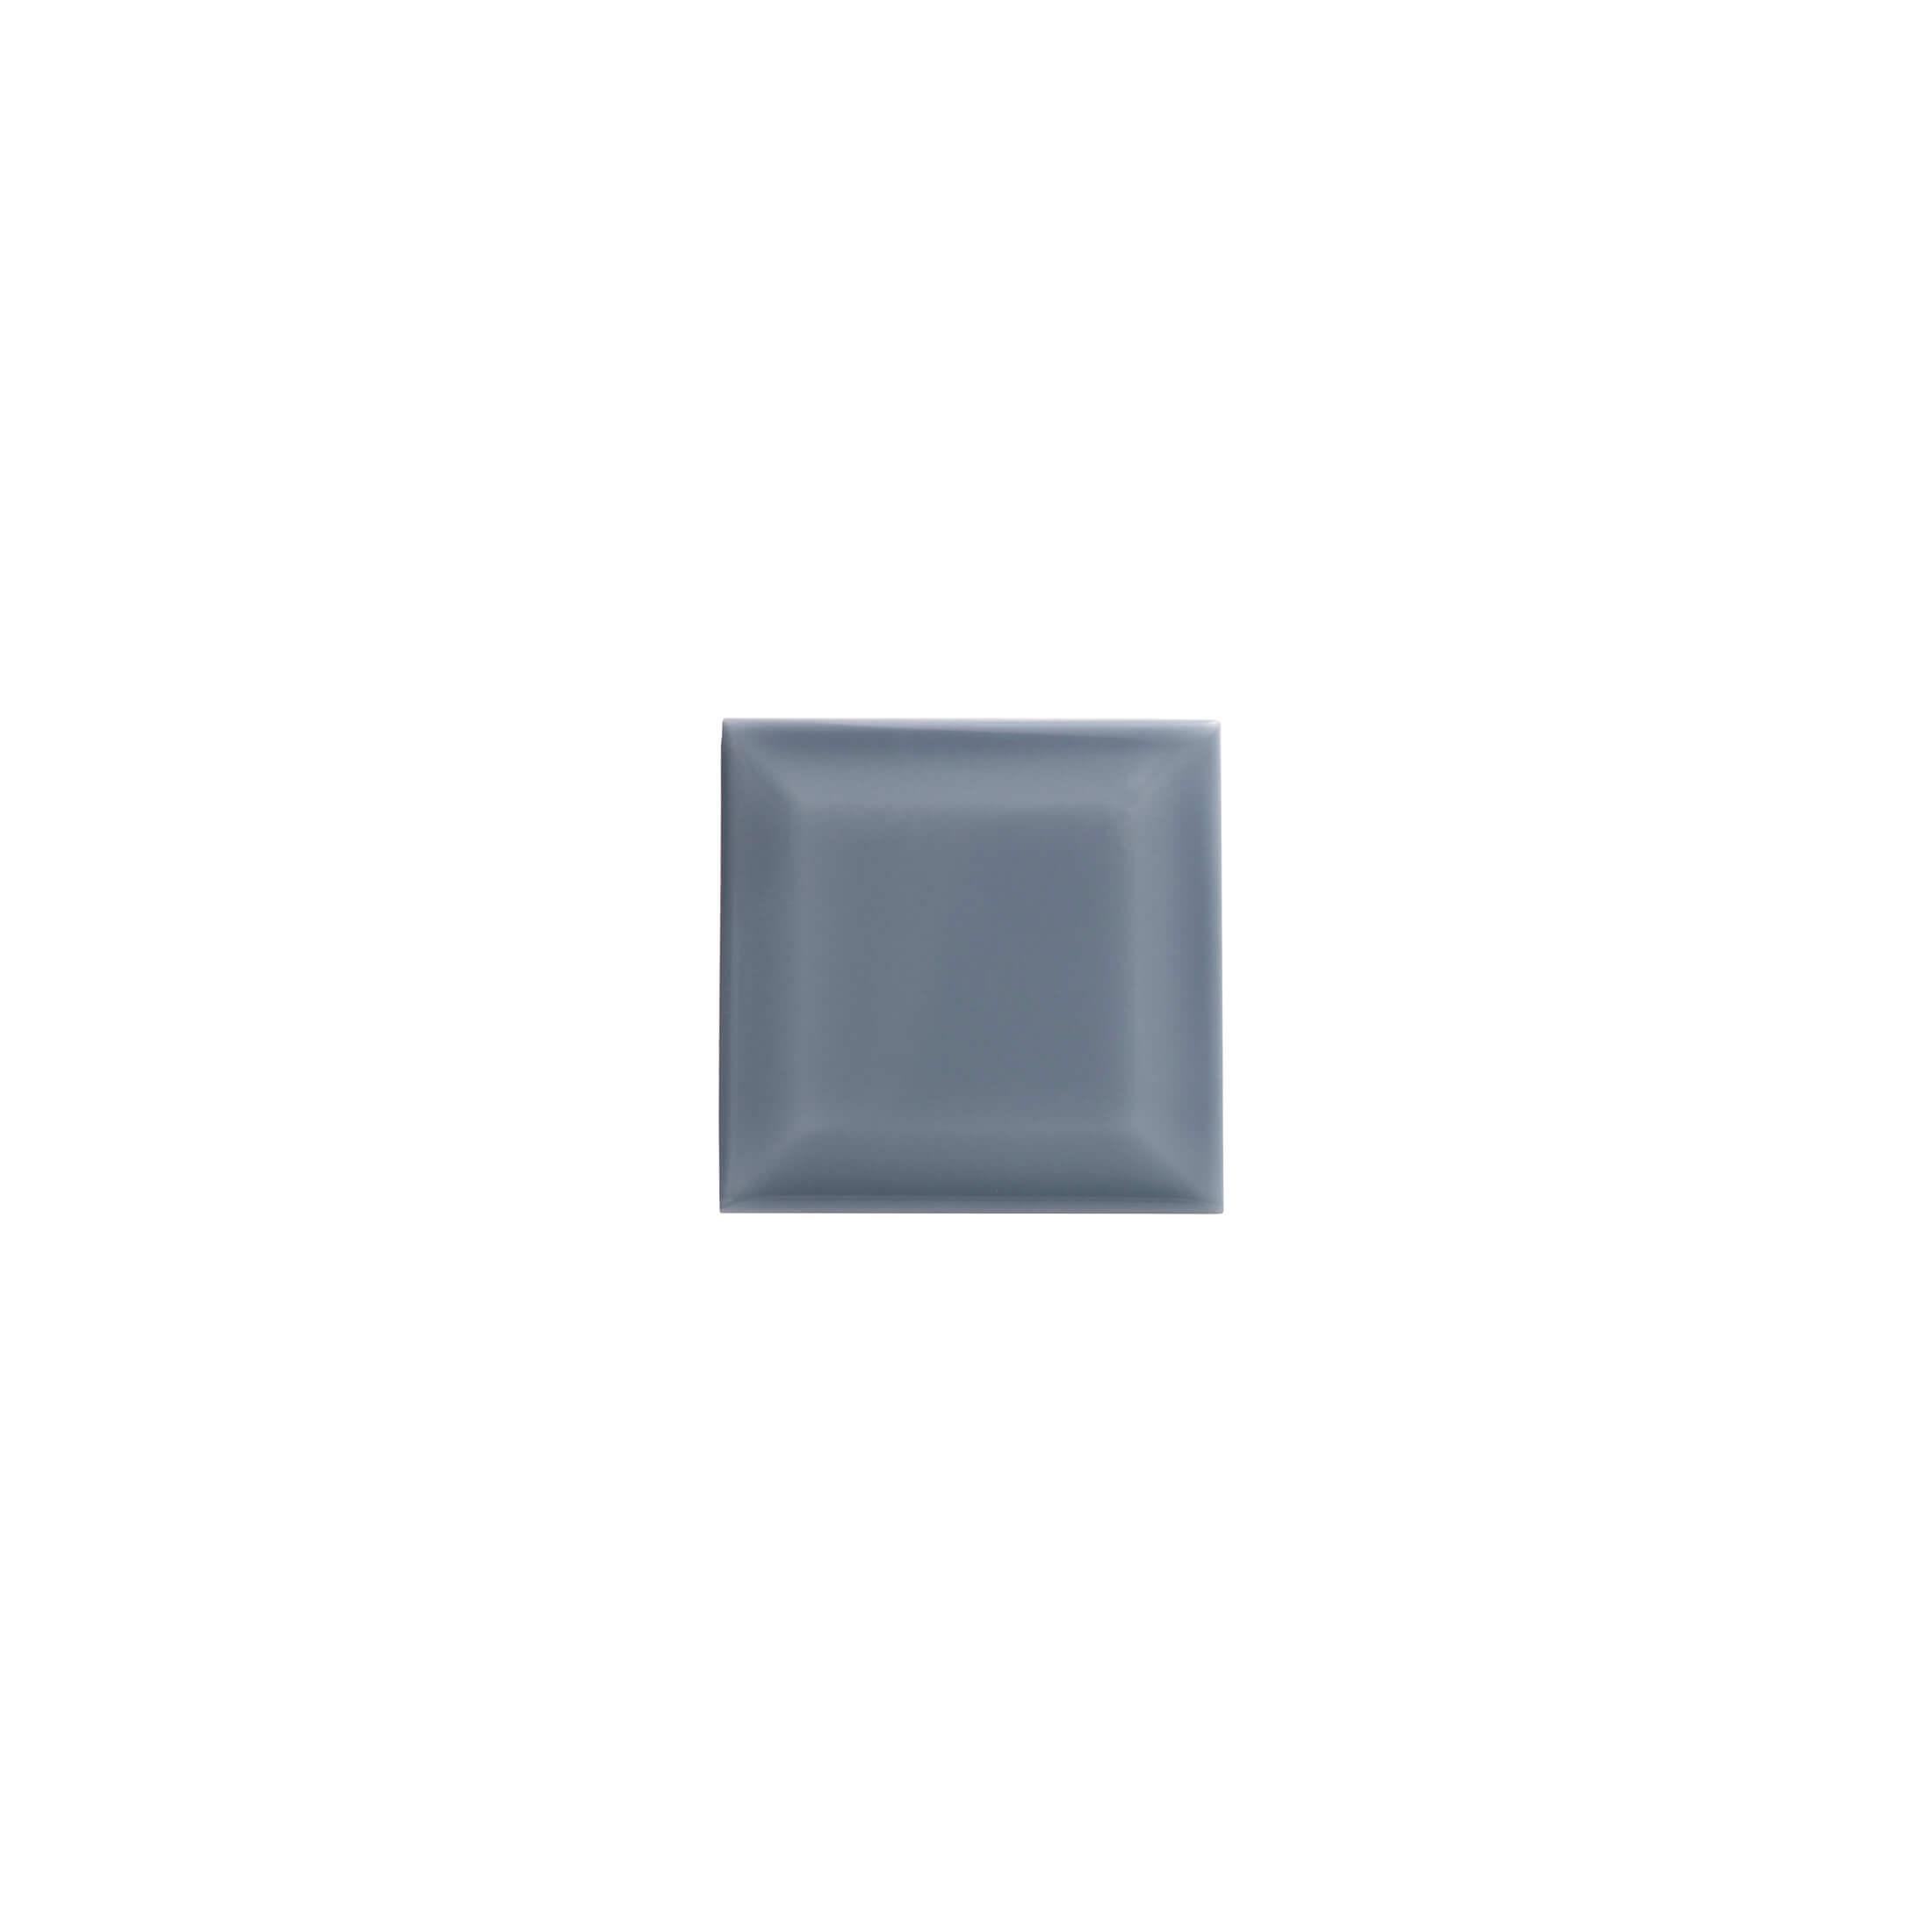 ADNE5609 - BISELADO PB - 7.5 cm X 7.5 cm